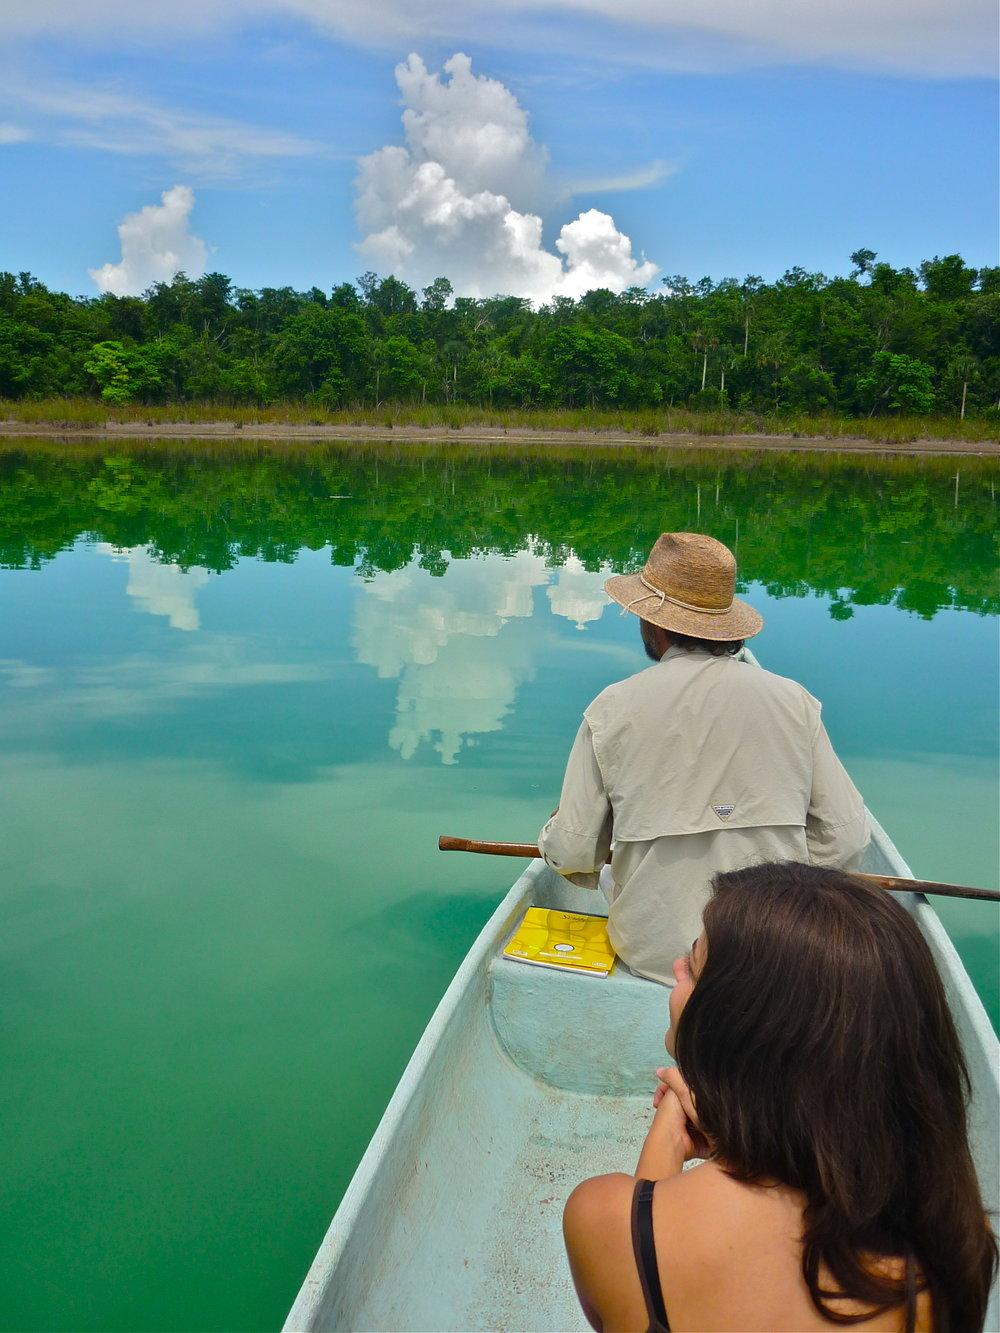 Canoe Punta laguna